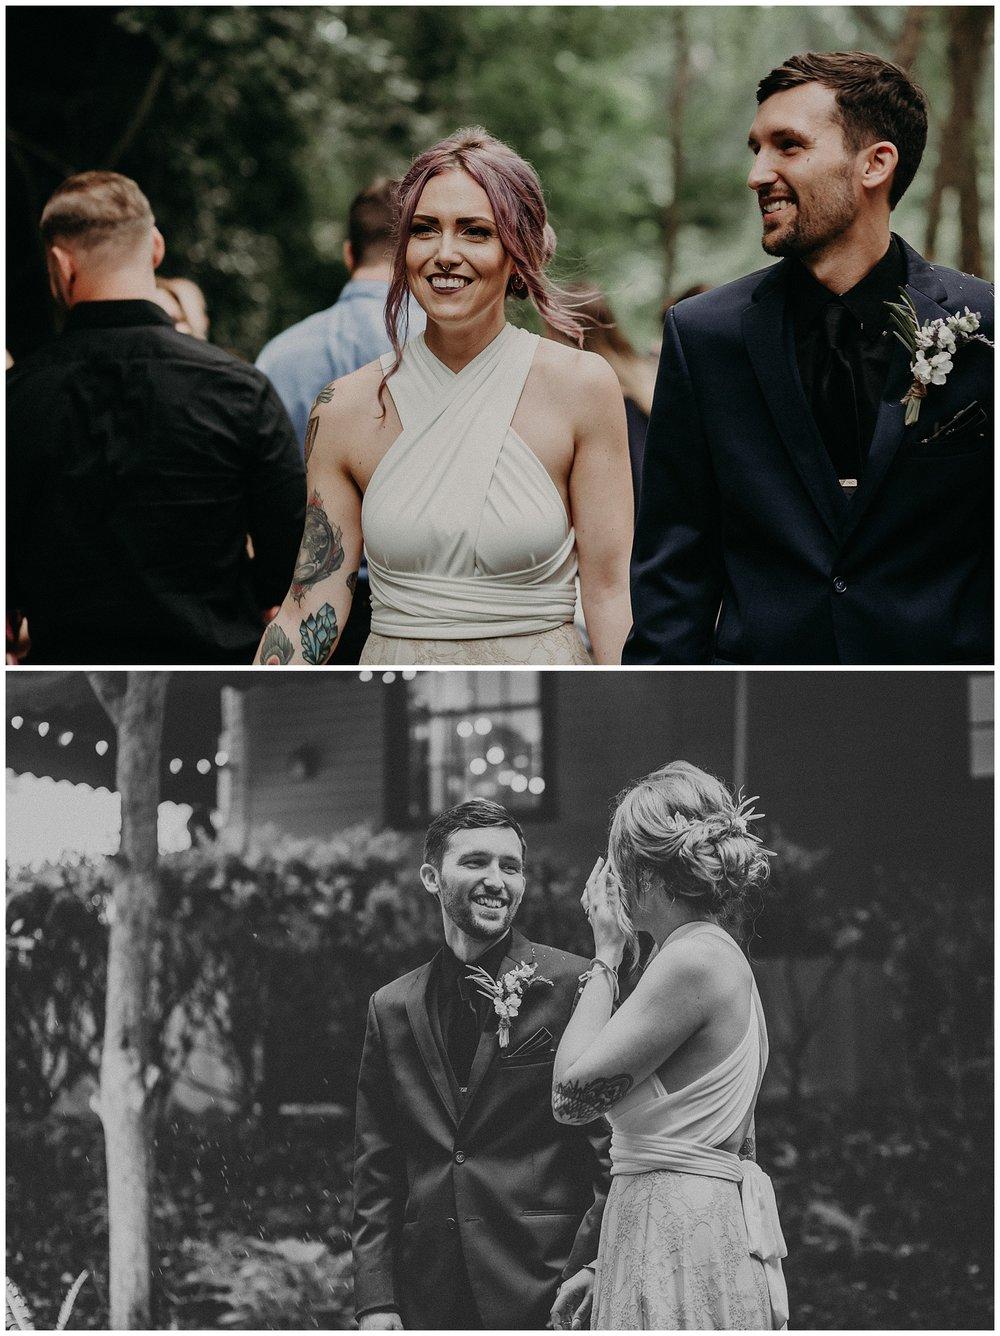 Outdoor Summer Boho Wedding at Ridgeland Manion in Downtown Philadelphia Pennsylvania_0100.jpg